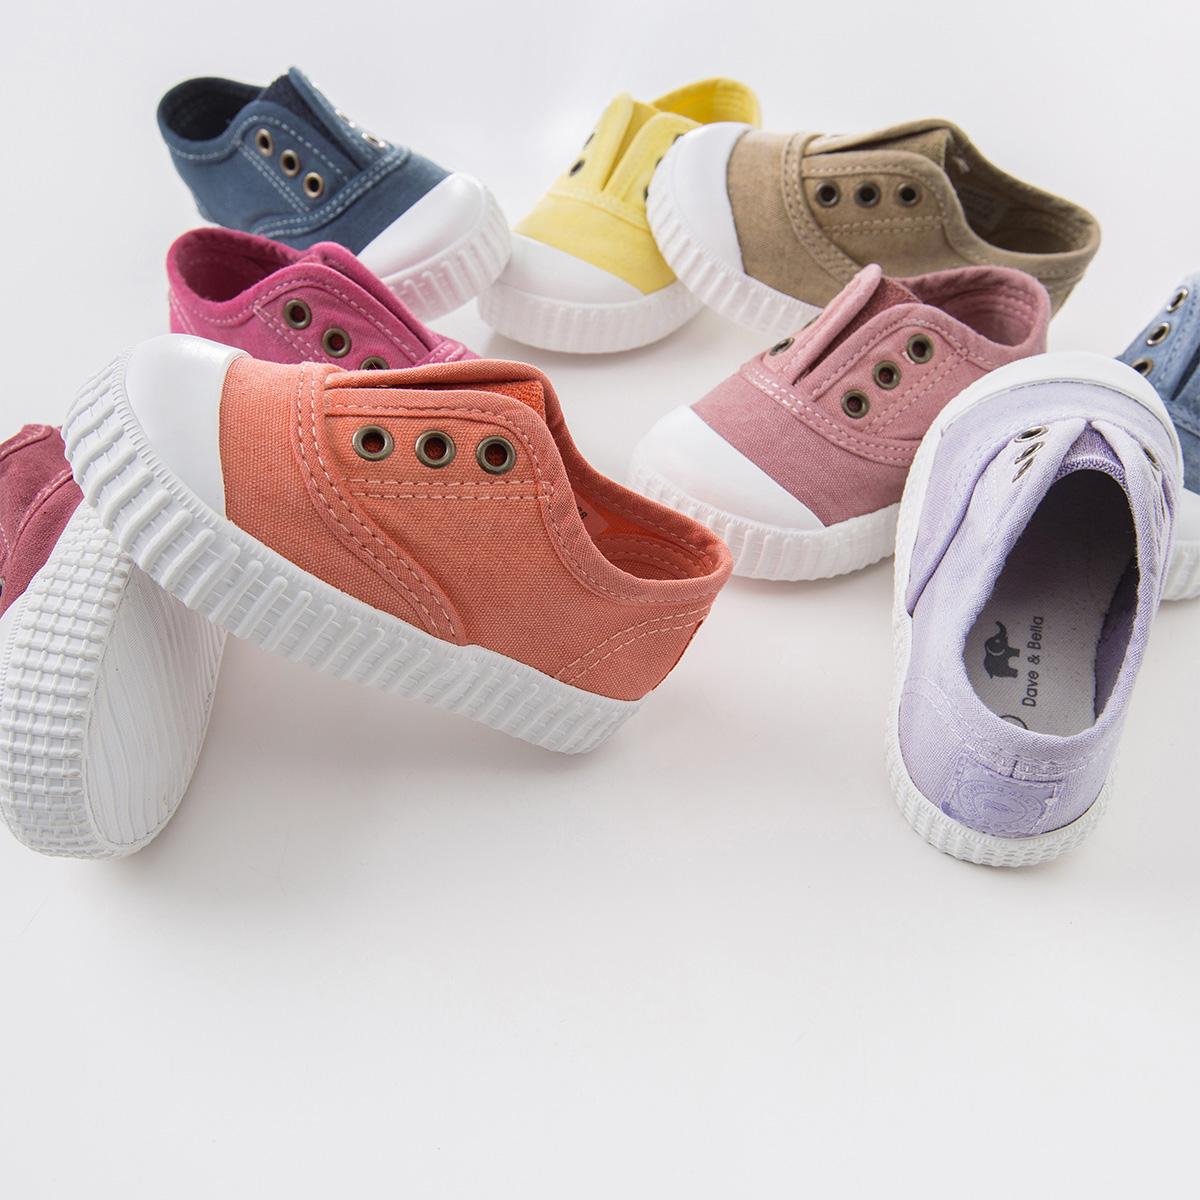 davebella戴维贝拉秋儿童帆布鞋男女宝宝布鞋糖果色鞋子DB4688